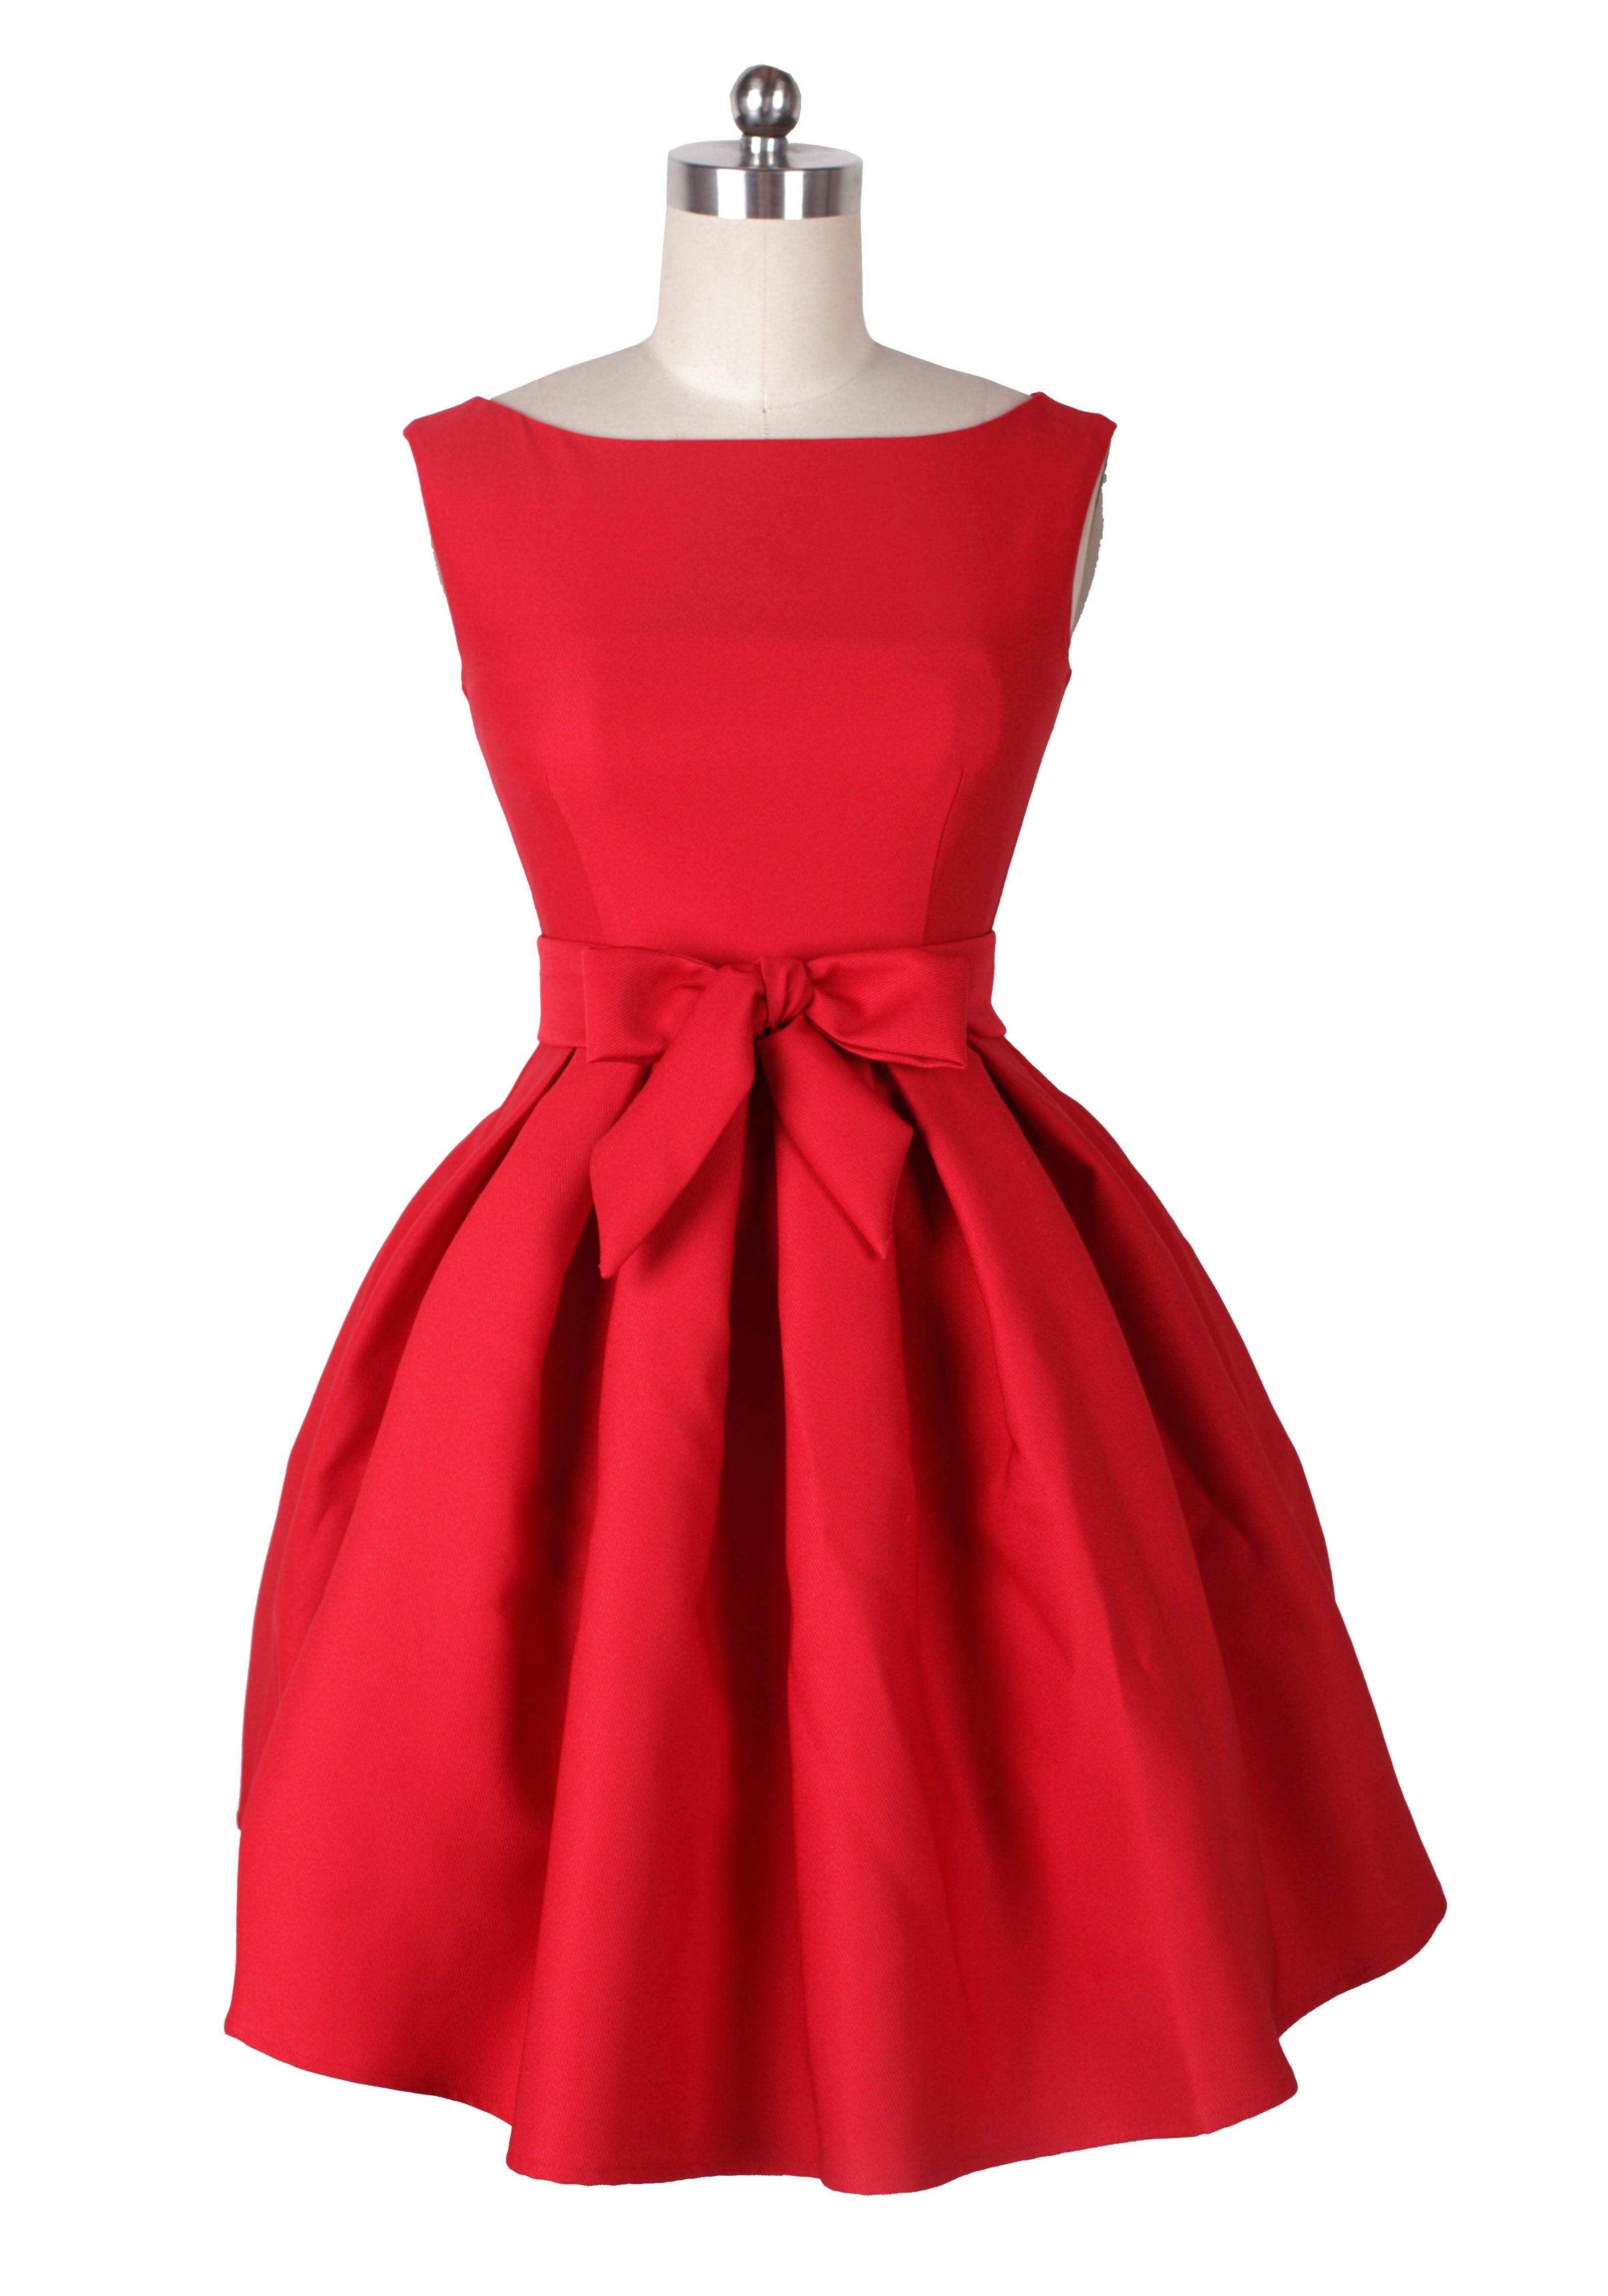 Modern-Day Audrey Hepburn Dress | ReoRia